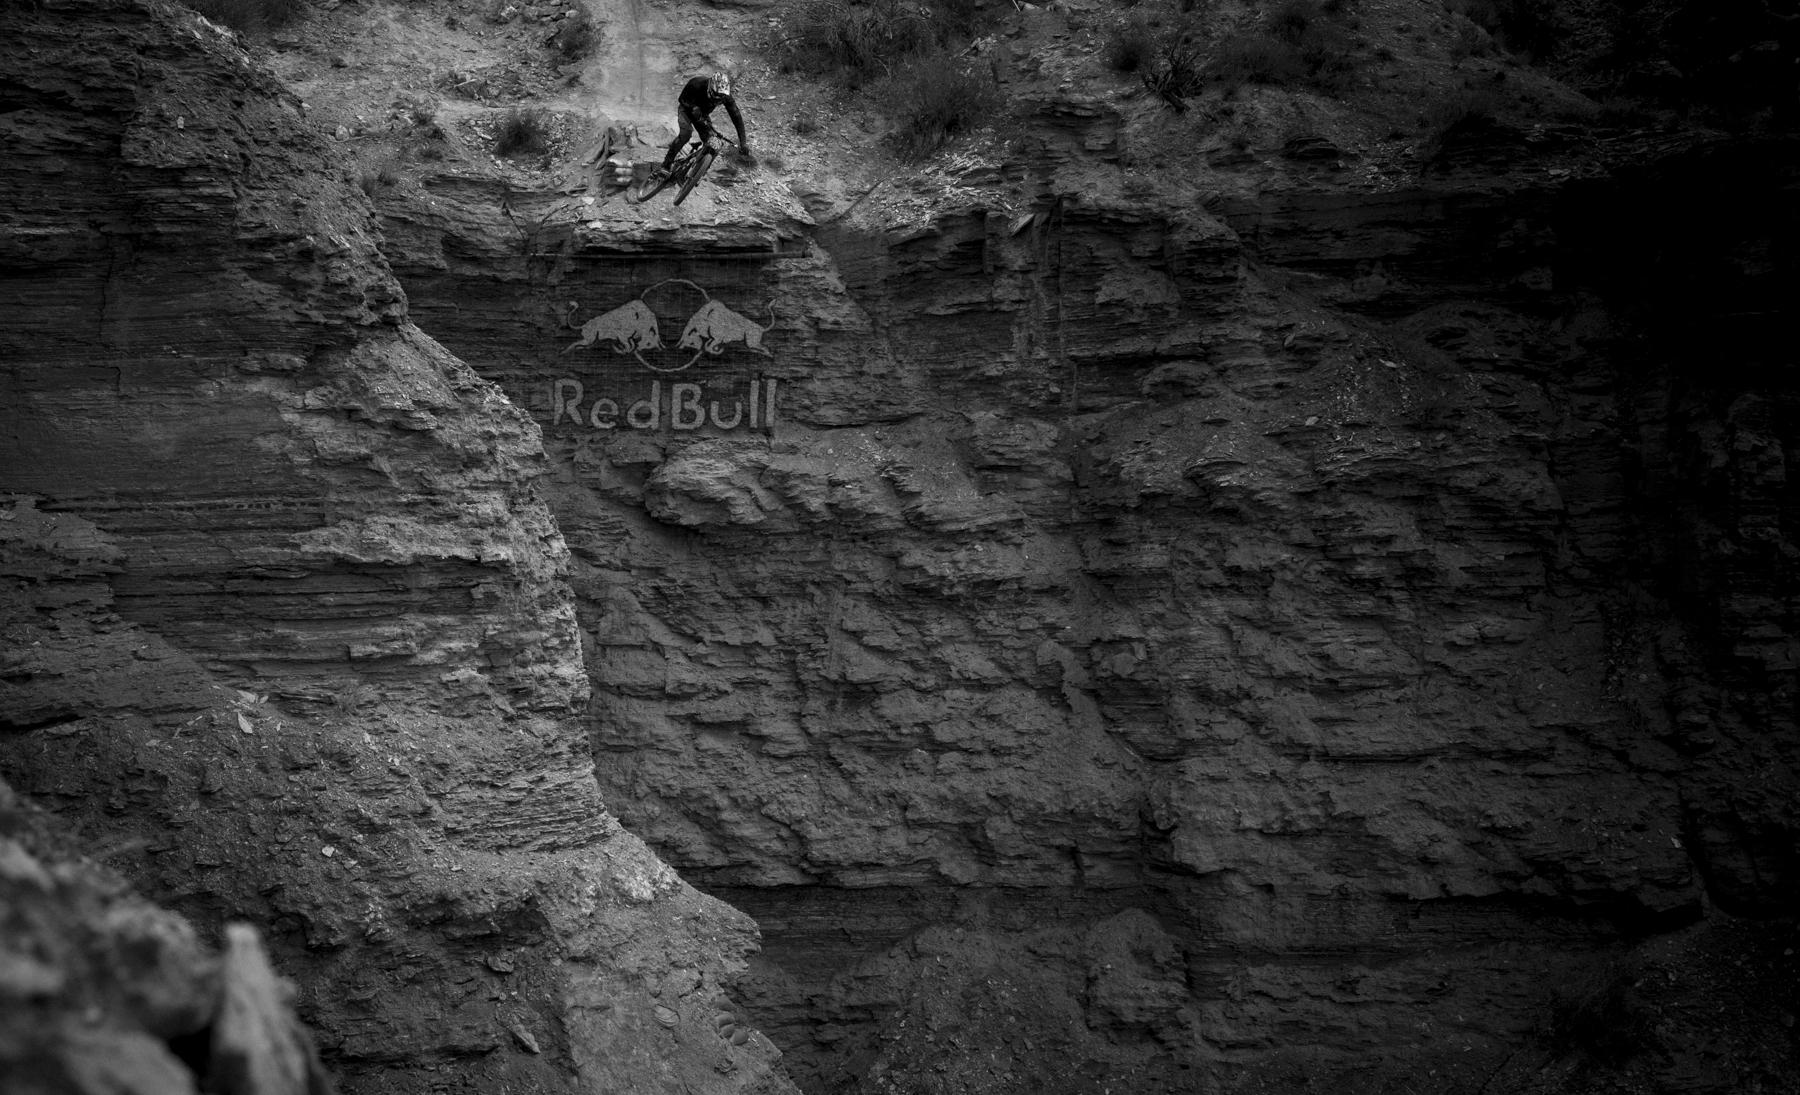 Red Bull Rampage.  Virgin, Utah 2013